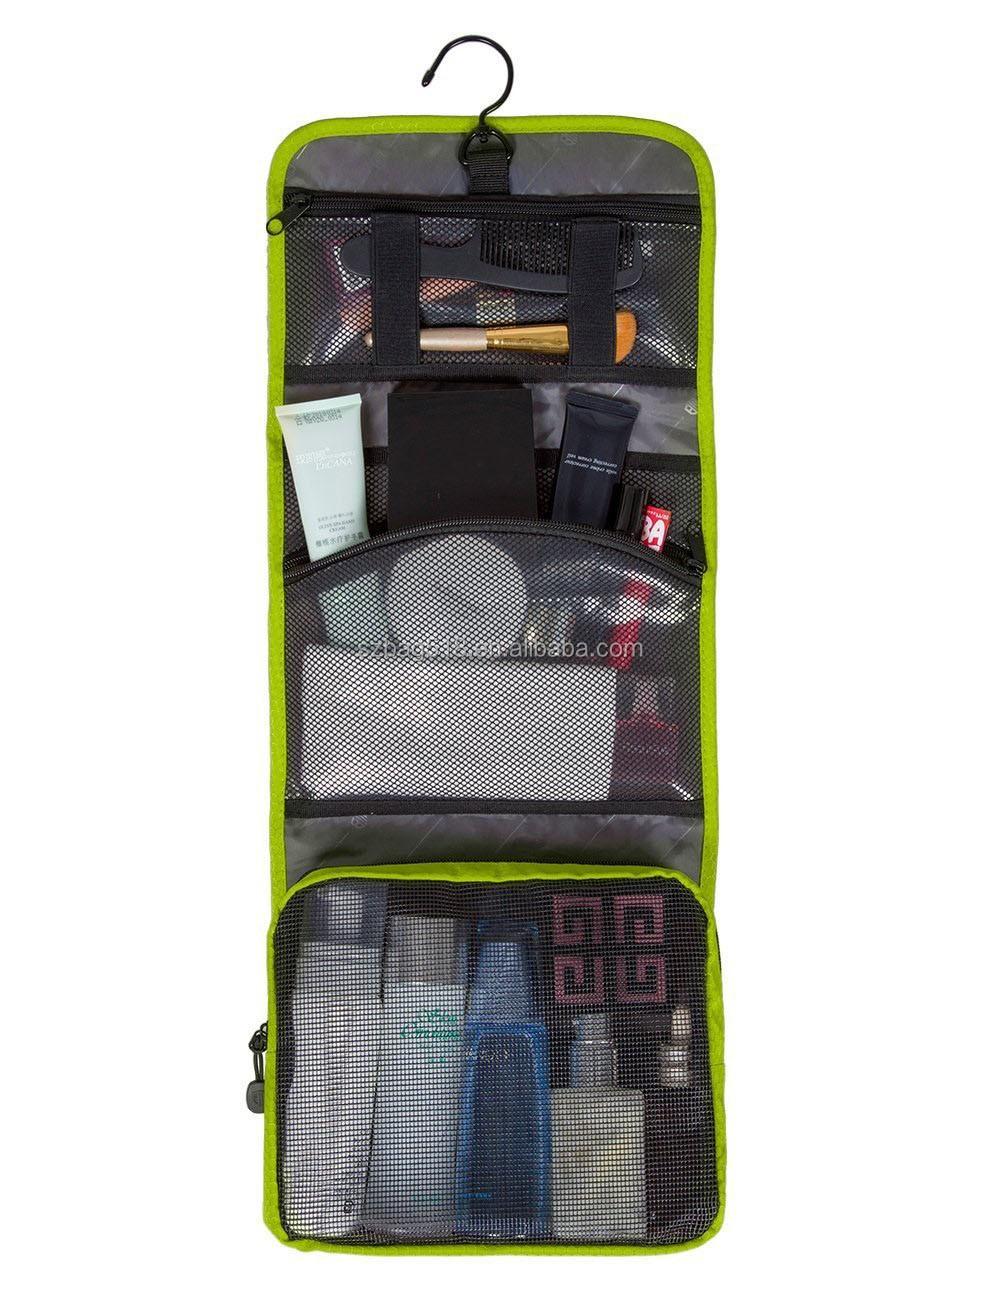 Nylon Cosmetic Make Up Case Hanging Travel Toiletry Bag Buy Travel Toiletry Bag Hanging Toiletry Case Cosmetic Organizer Product On Alibaba Com